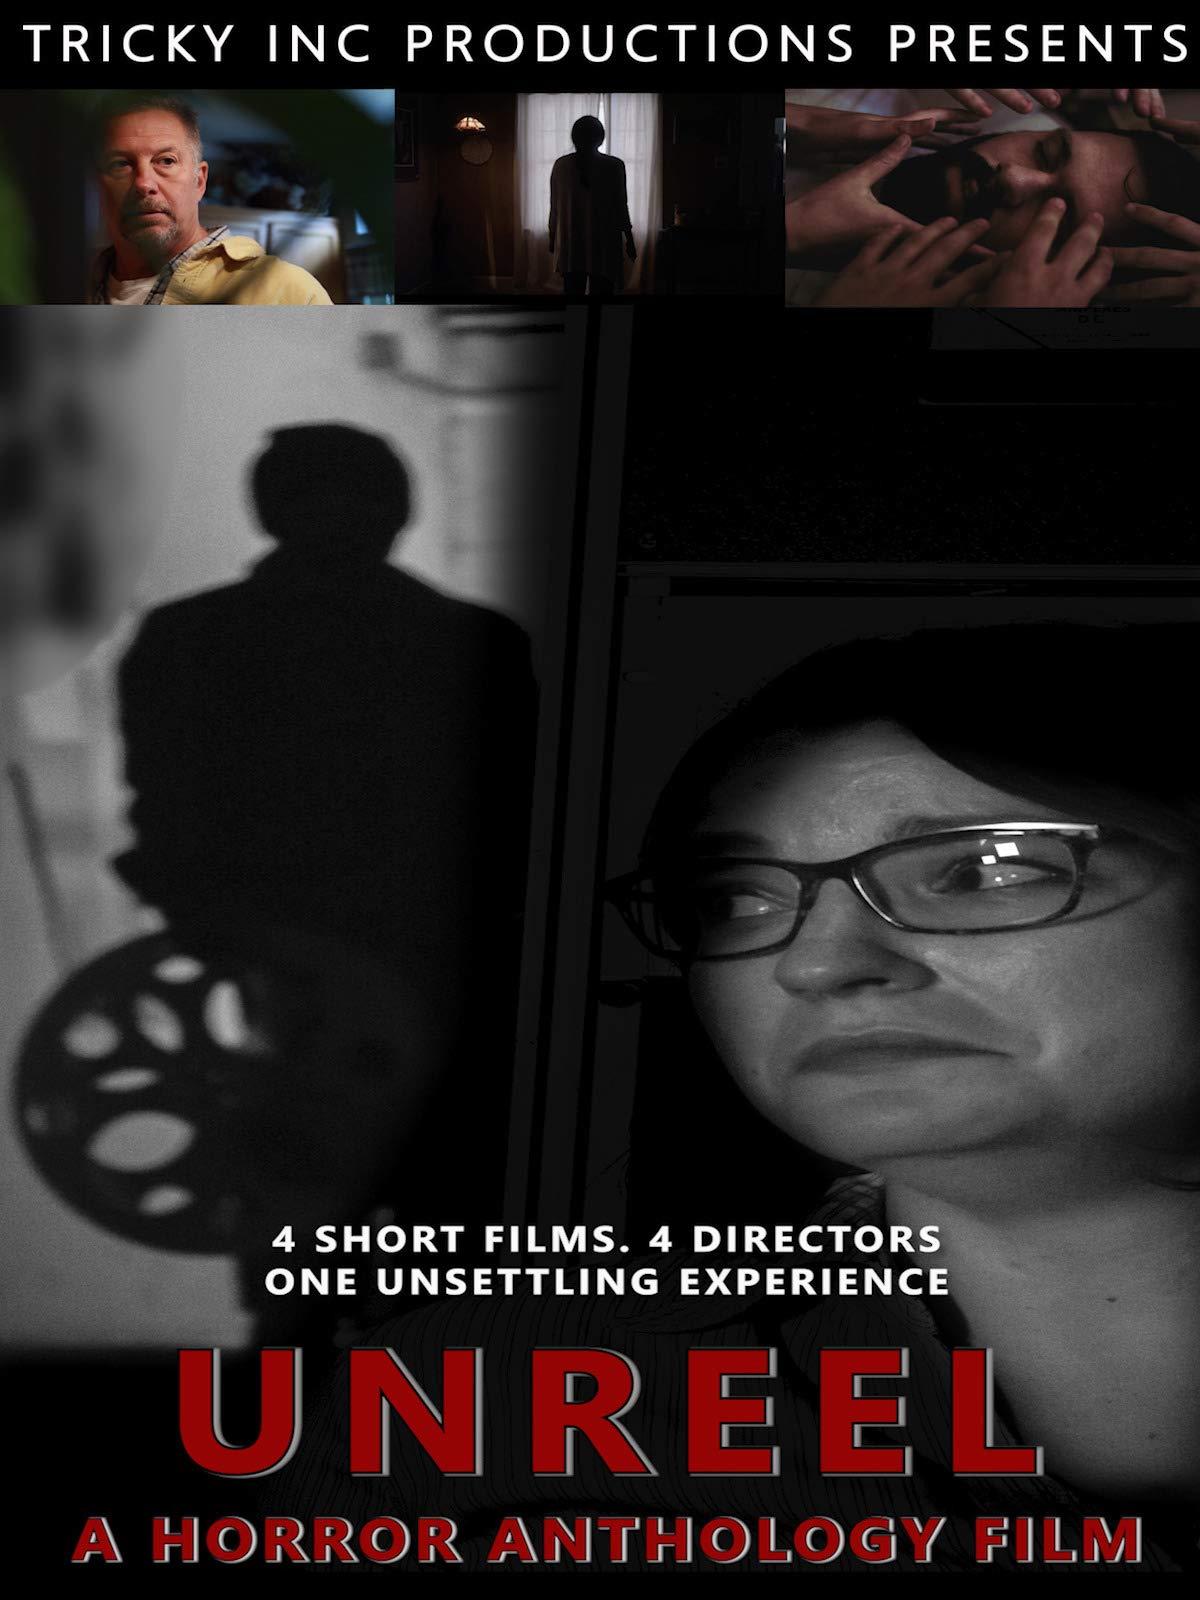 Unreel: A Horror Anthology Film